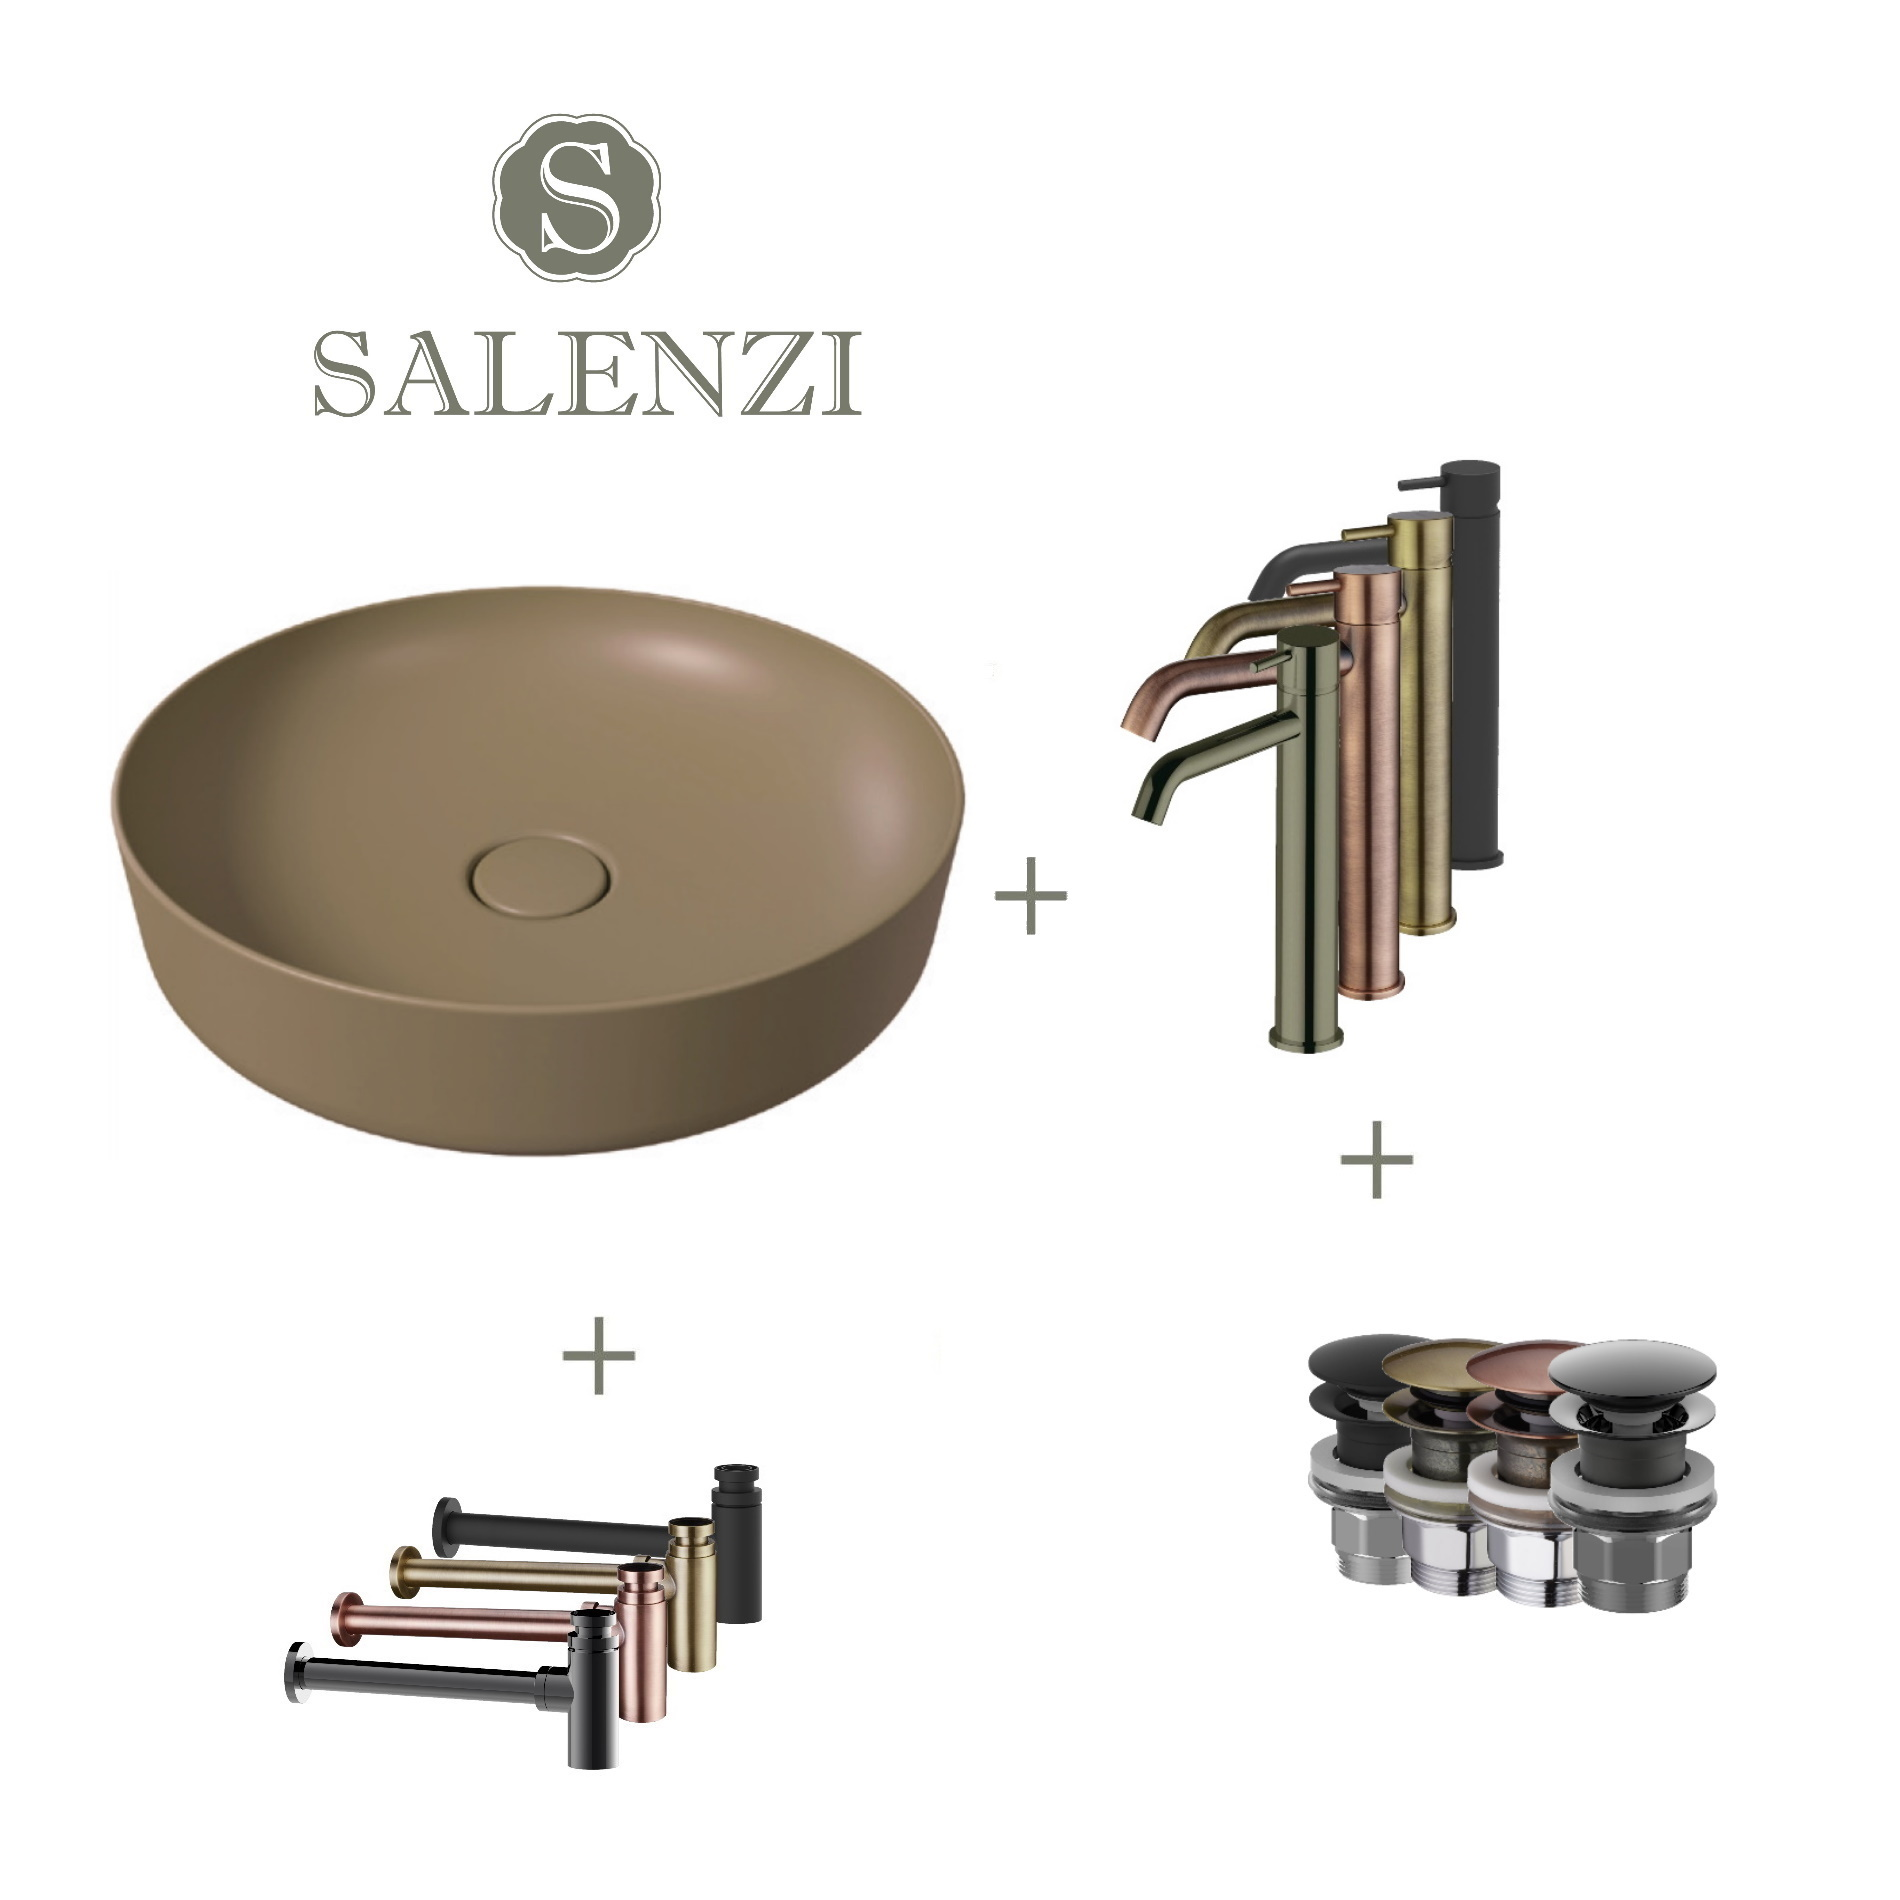 Salenzi Waskomset Form 45x12 cm Incl Hoge Kraan Mat Beige